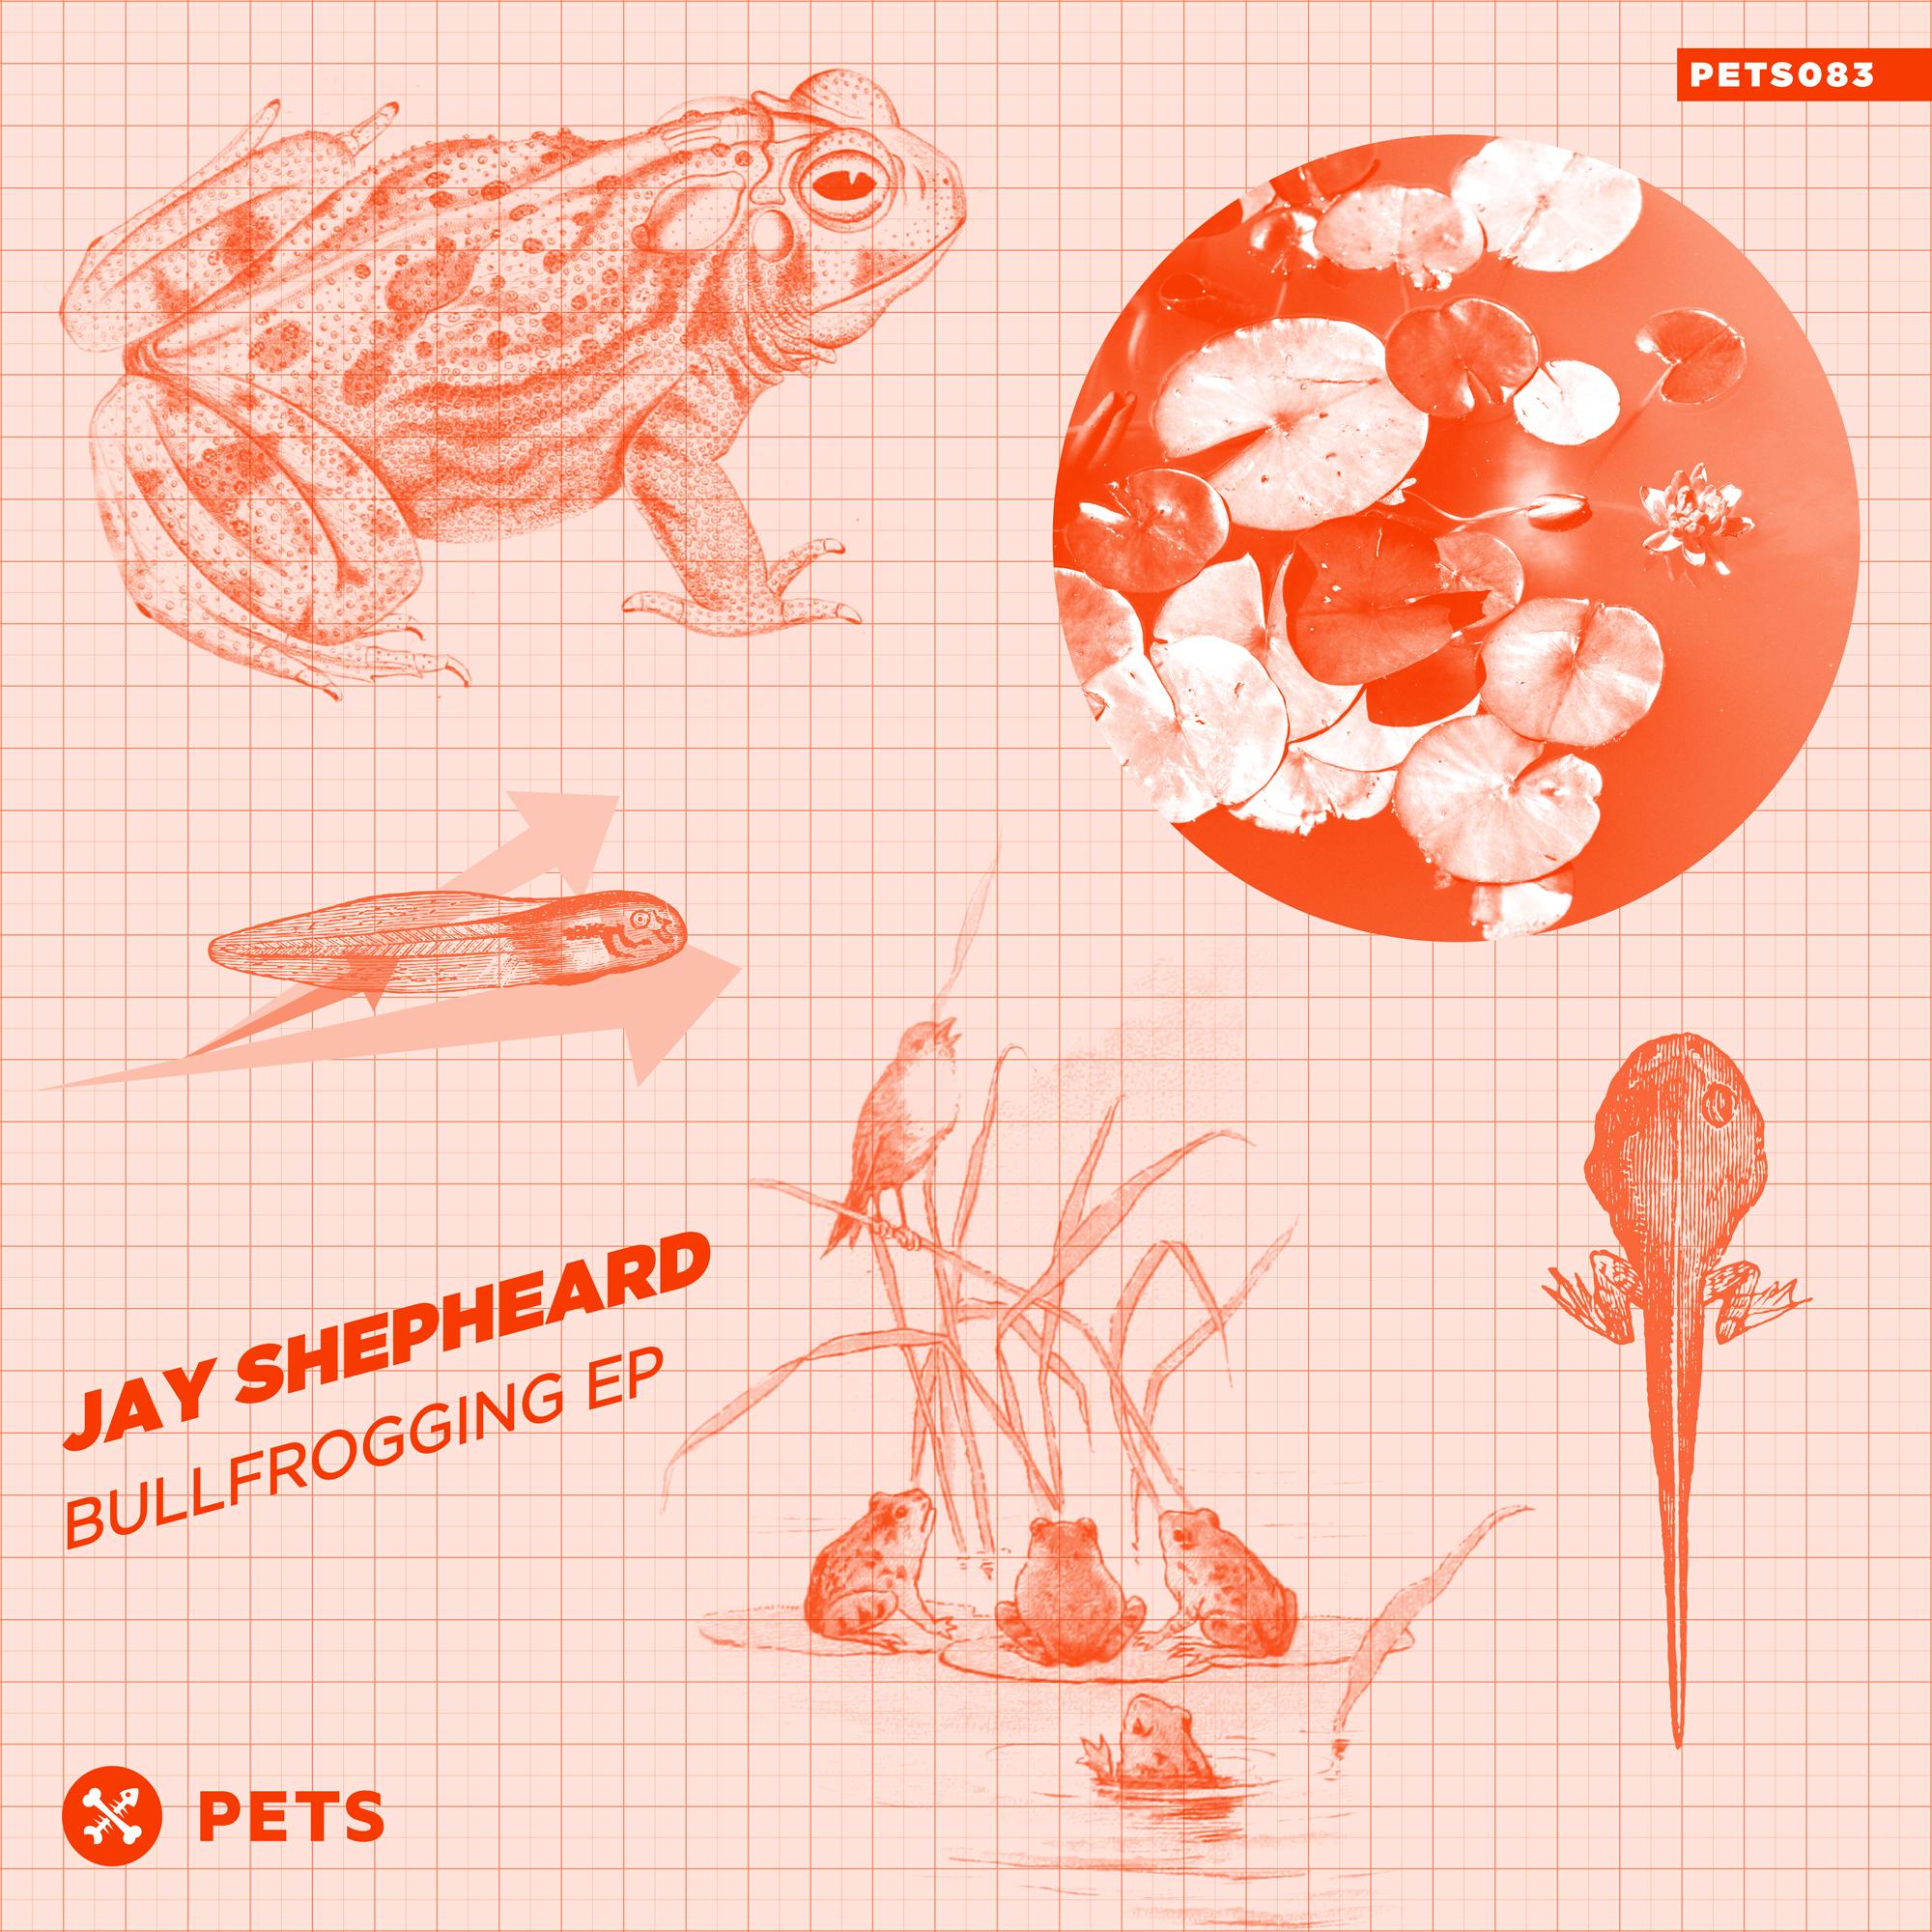 Jay Shepheard - Bullfrogging EP